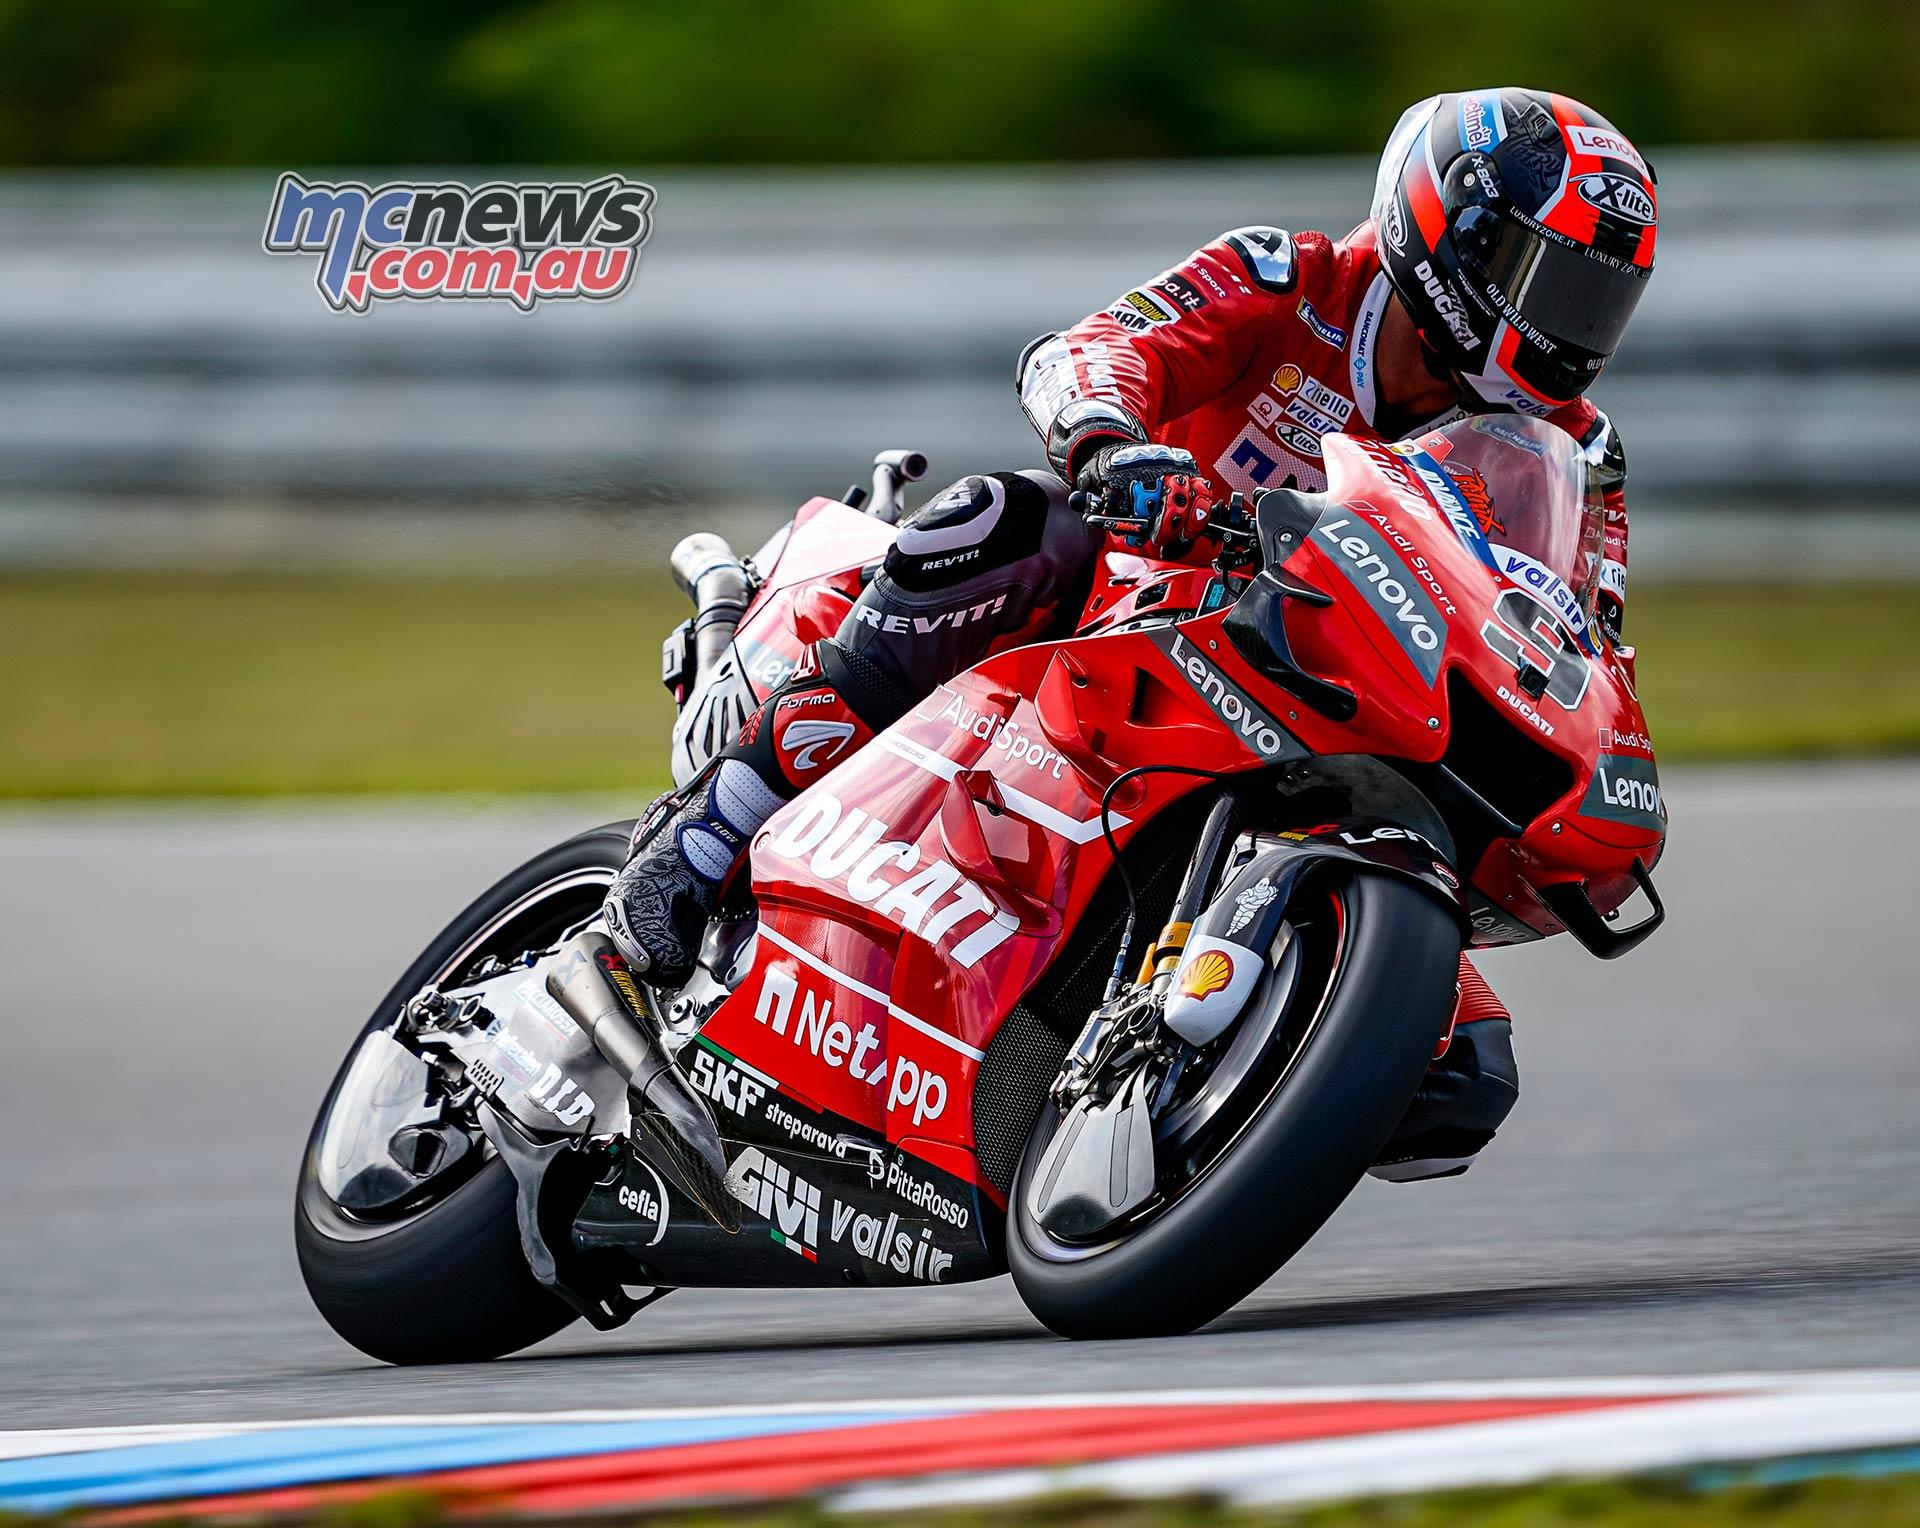 MotoGP Round Brno Fri Petrucci